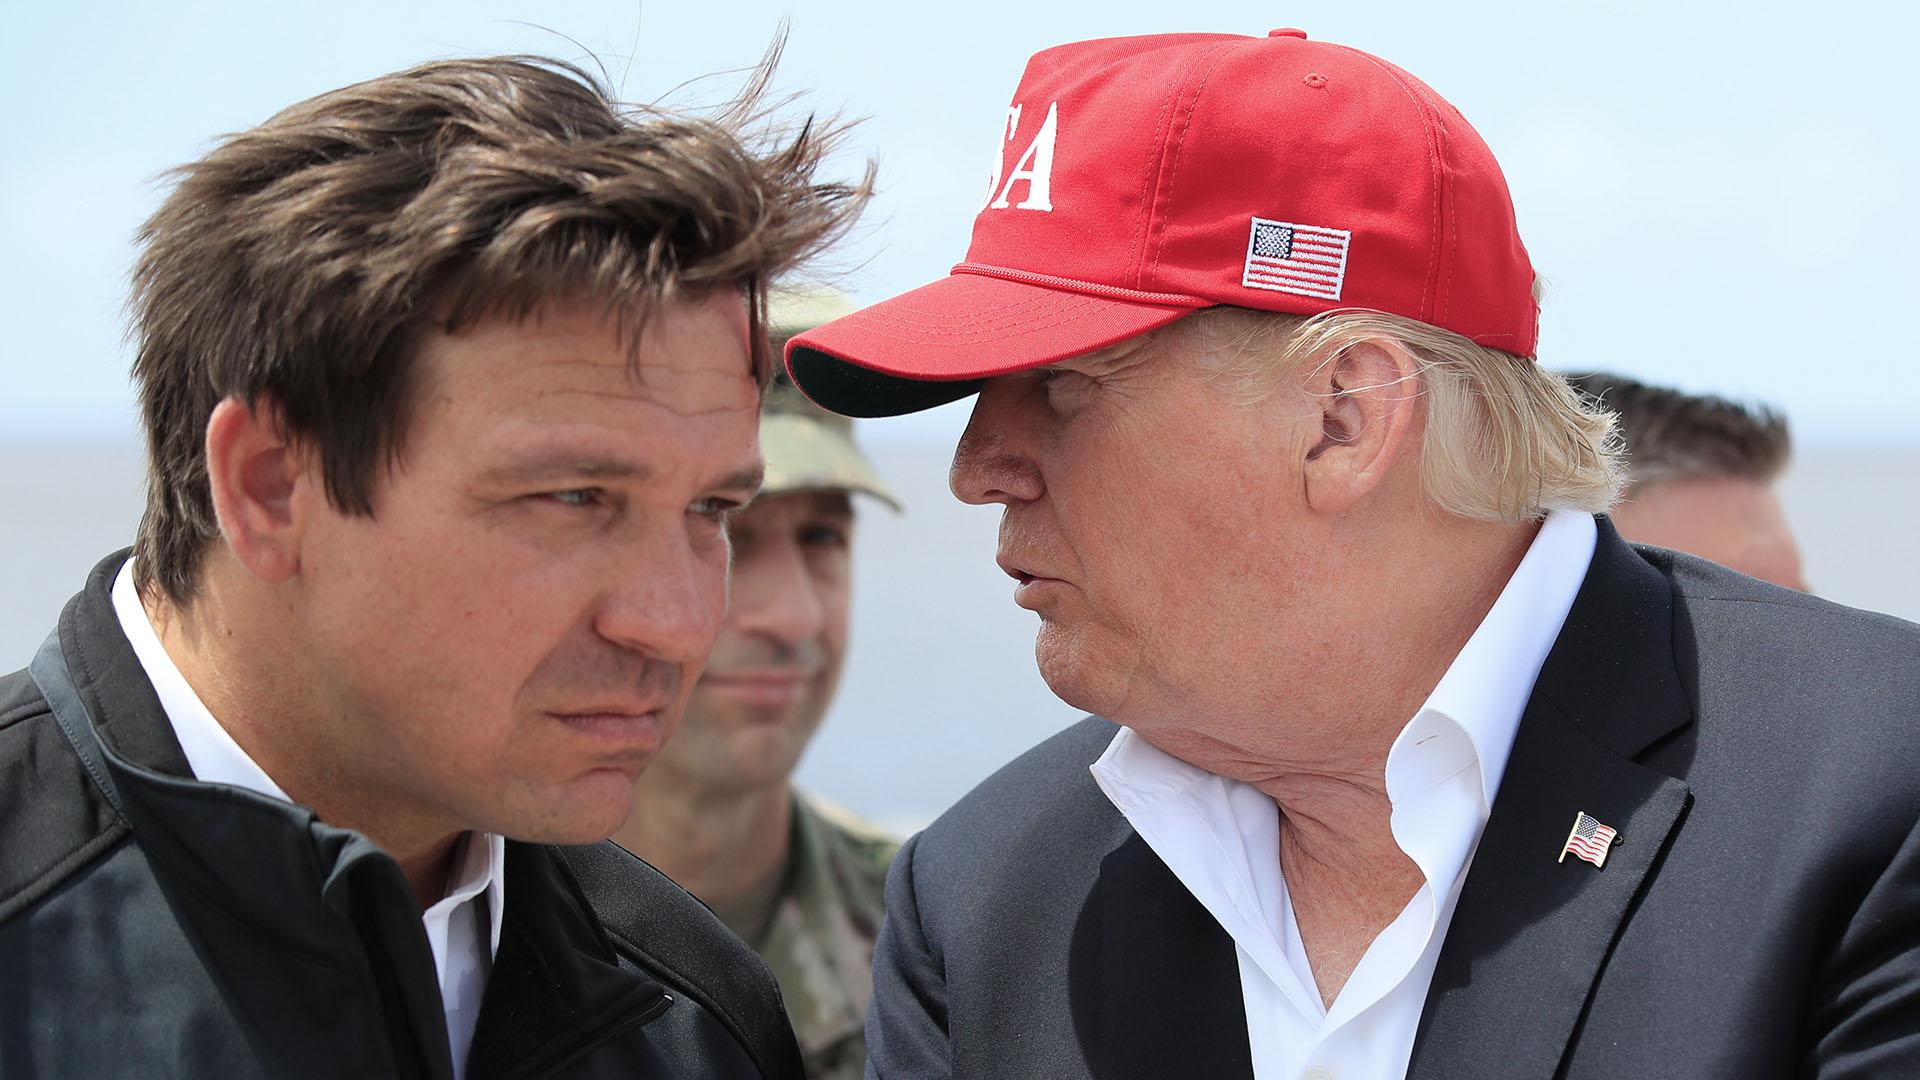 Trump Desantis_1560804409388.jpg.jpg